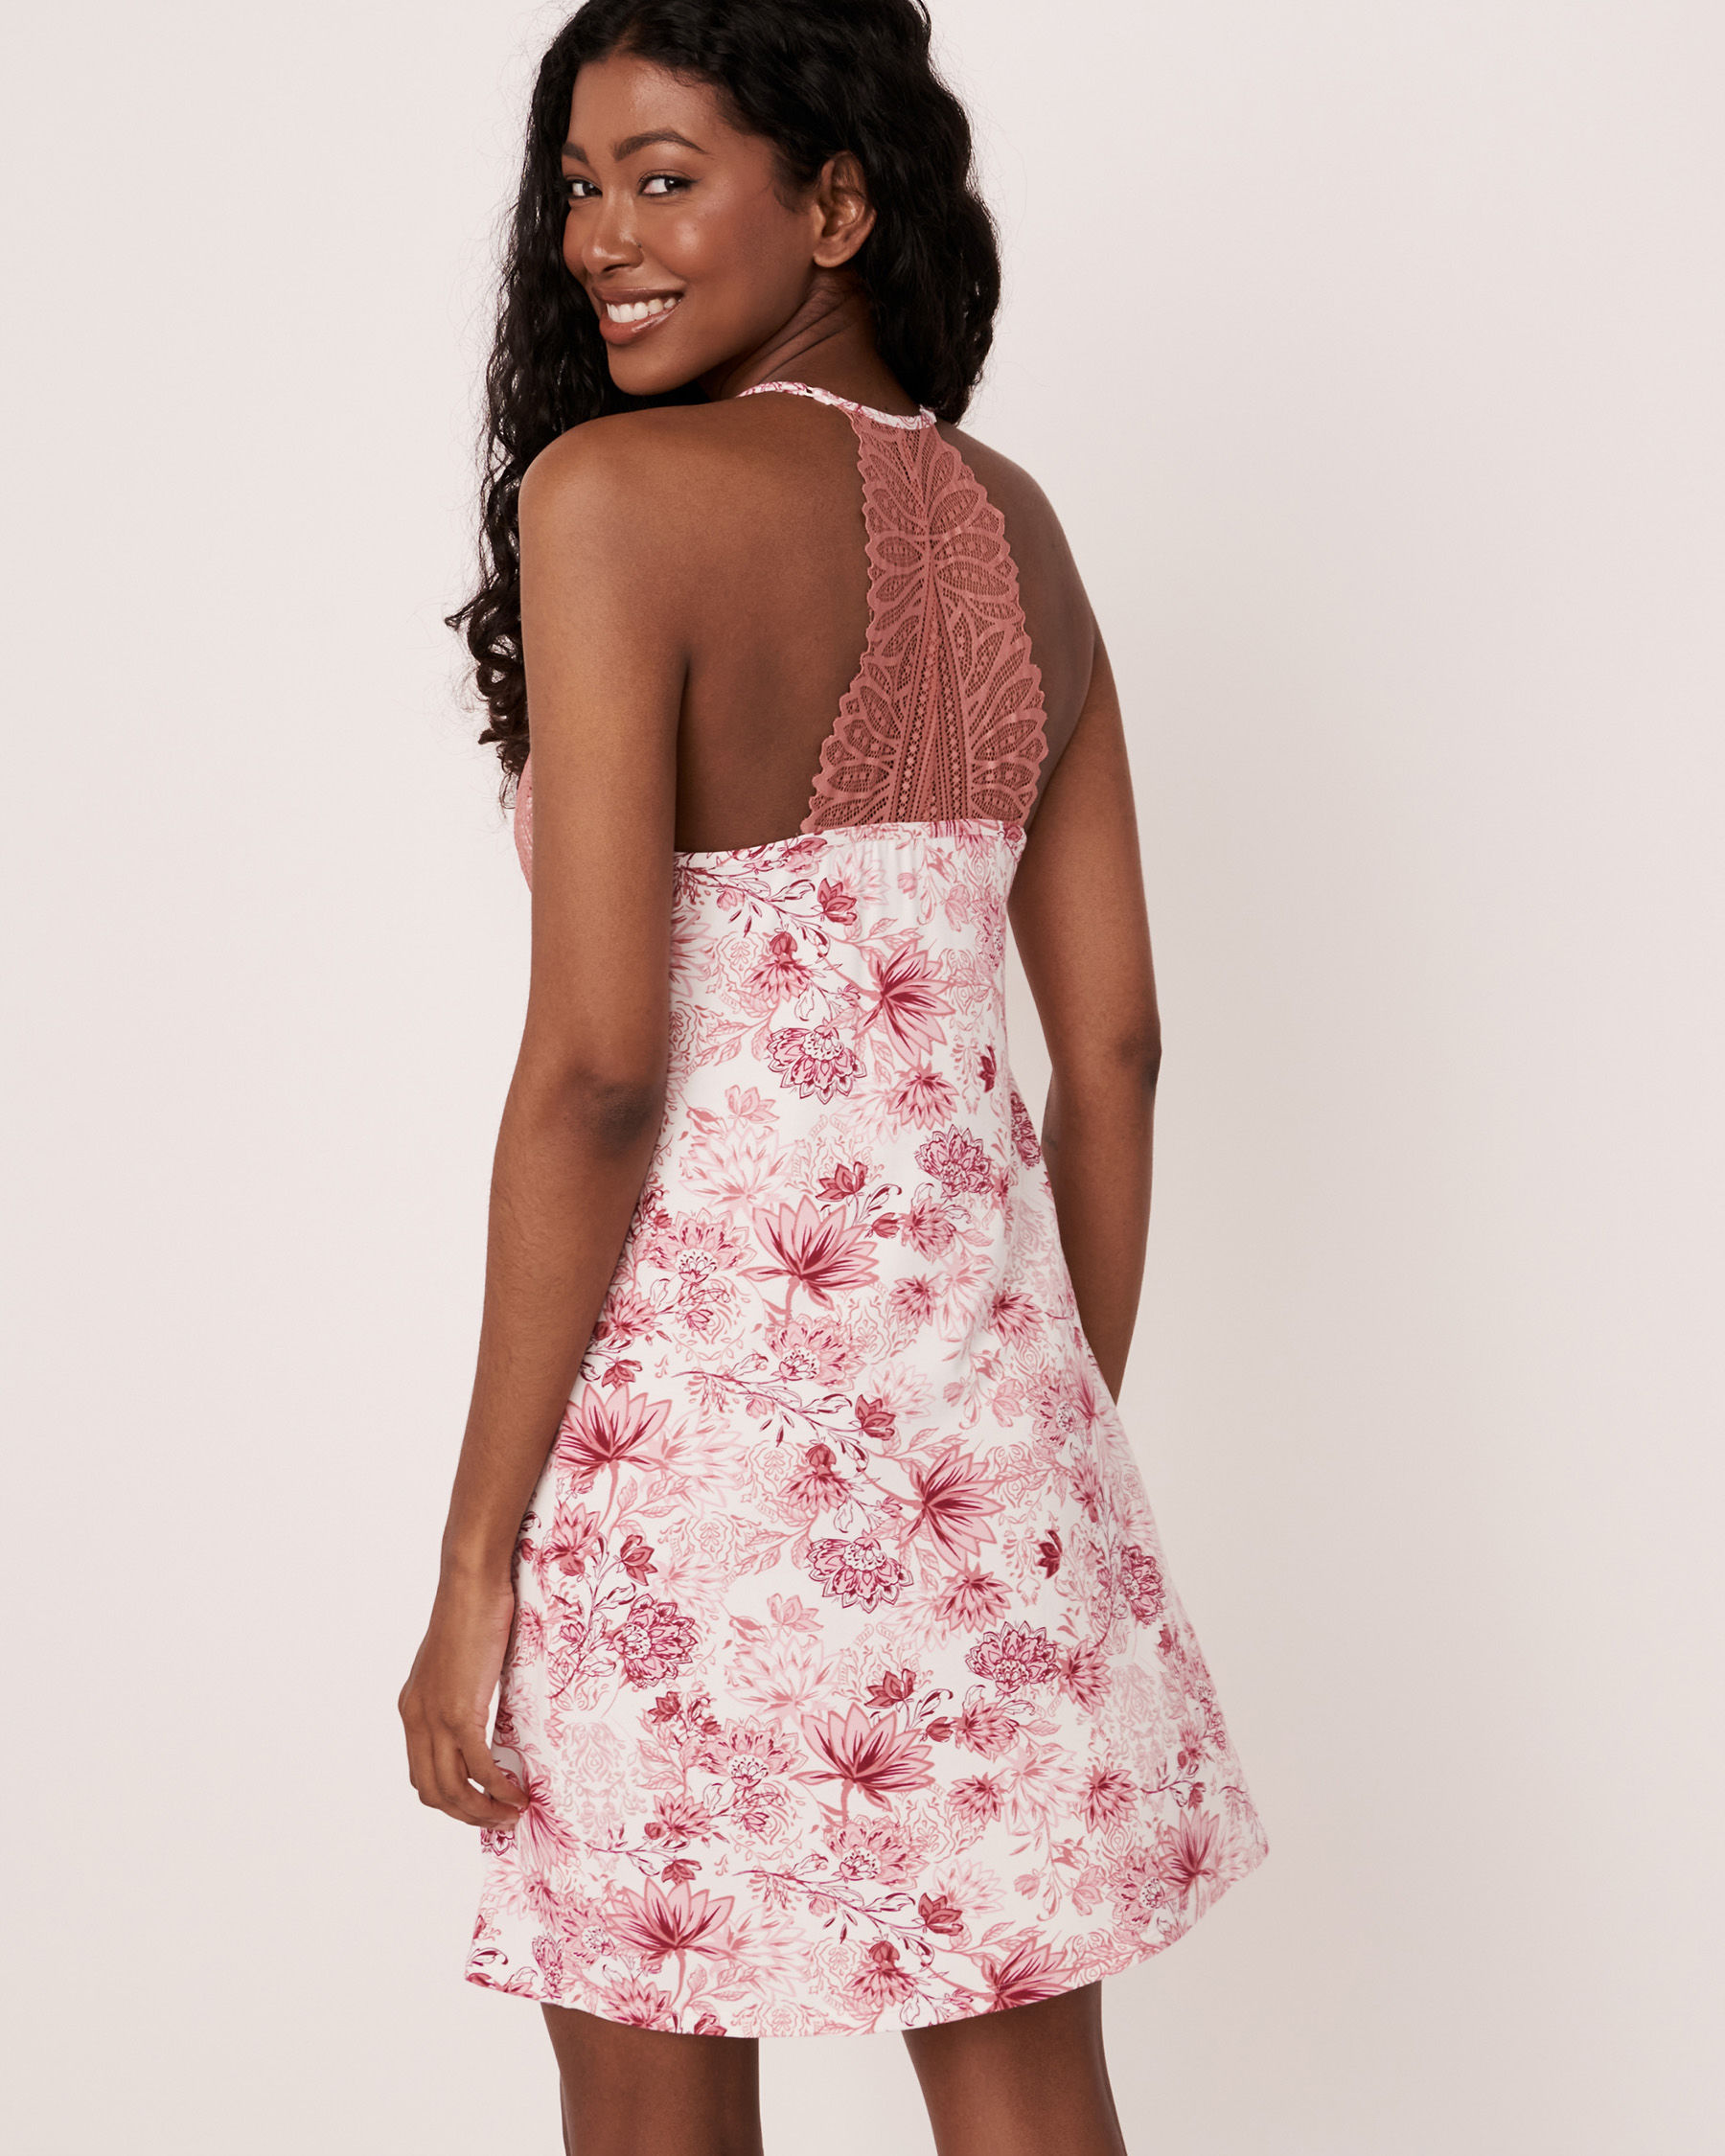 LA VIE EN ROSE Lace Trim Modal Nightie Pink flowers 40500064 - View2